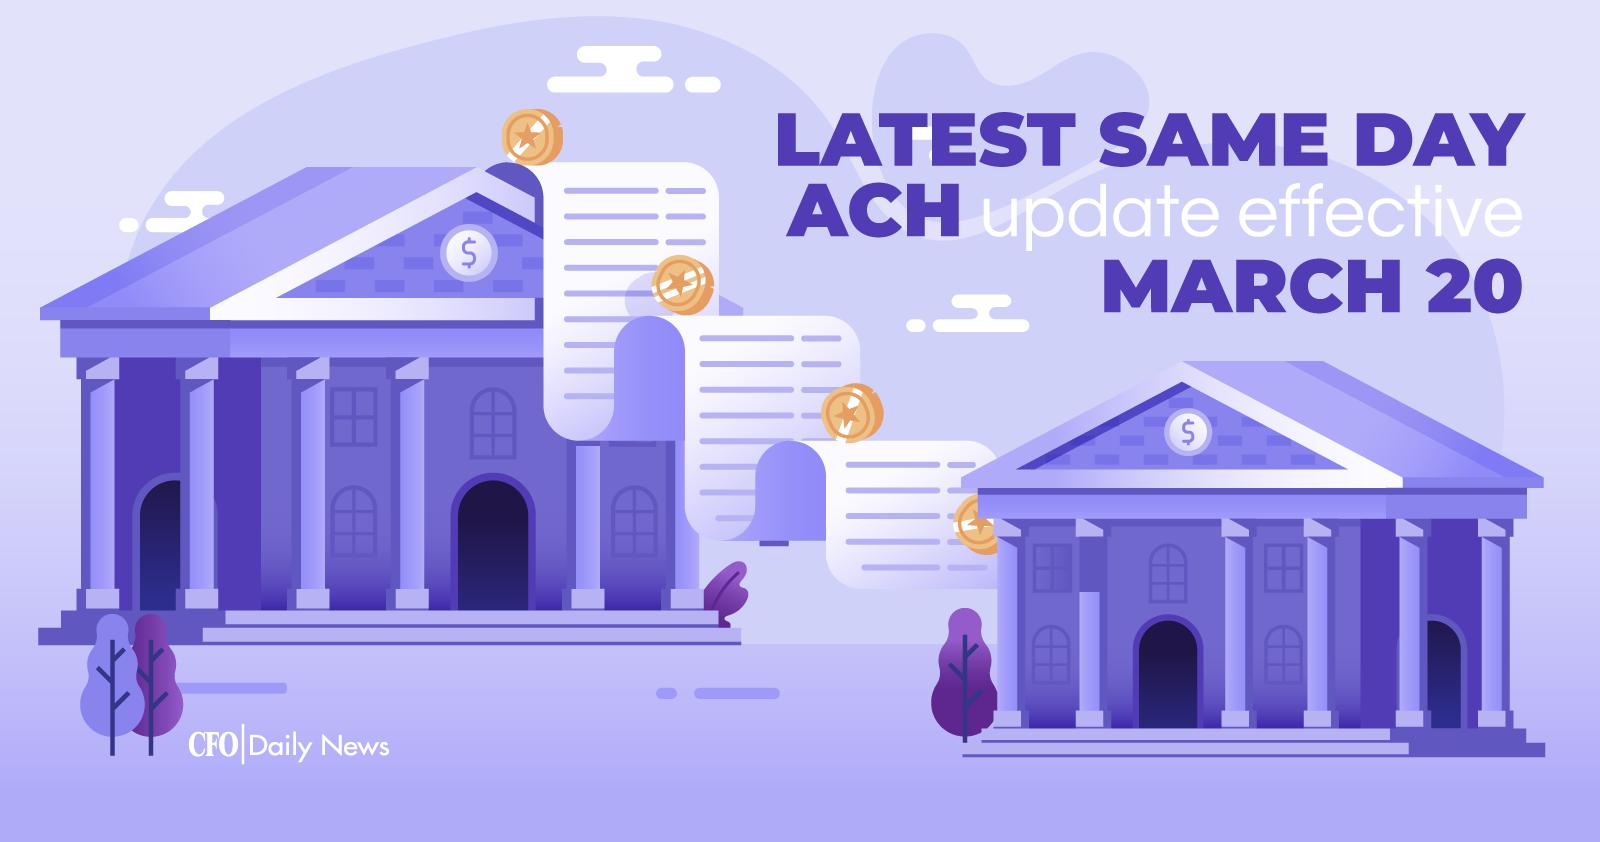 Latest Same Day ACH update effective March 20